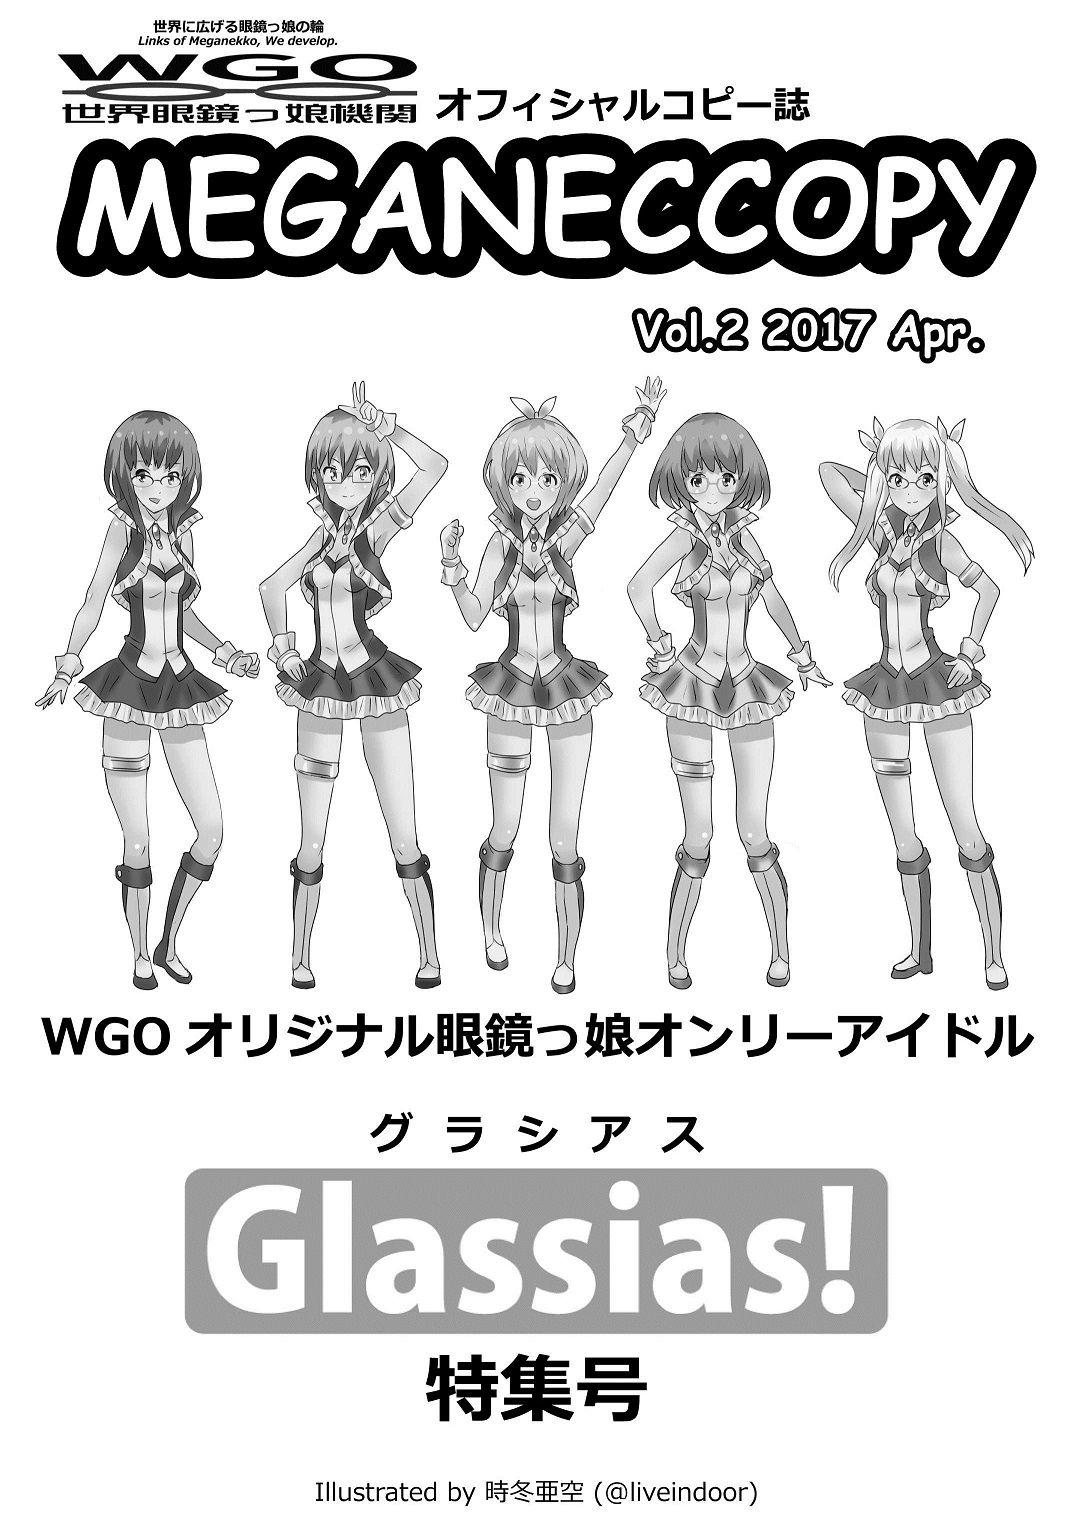 【WGO世界眼鏡っ娘機関 同人】WGO世界眼鏡っ娘機関オフィシャルコピー誌MEGANECCOPYVol.22017Apr.